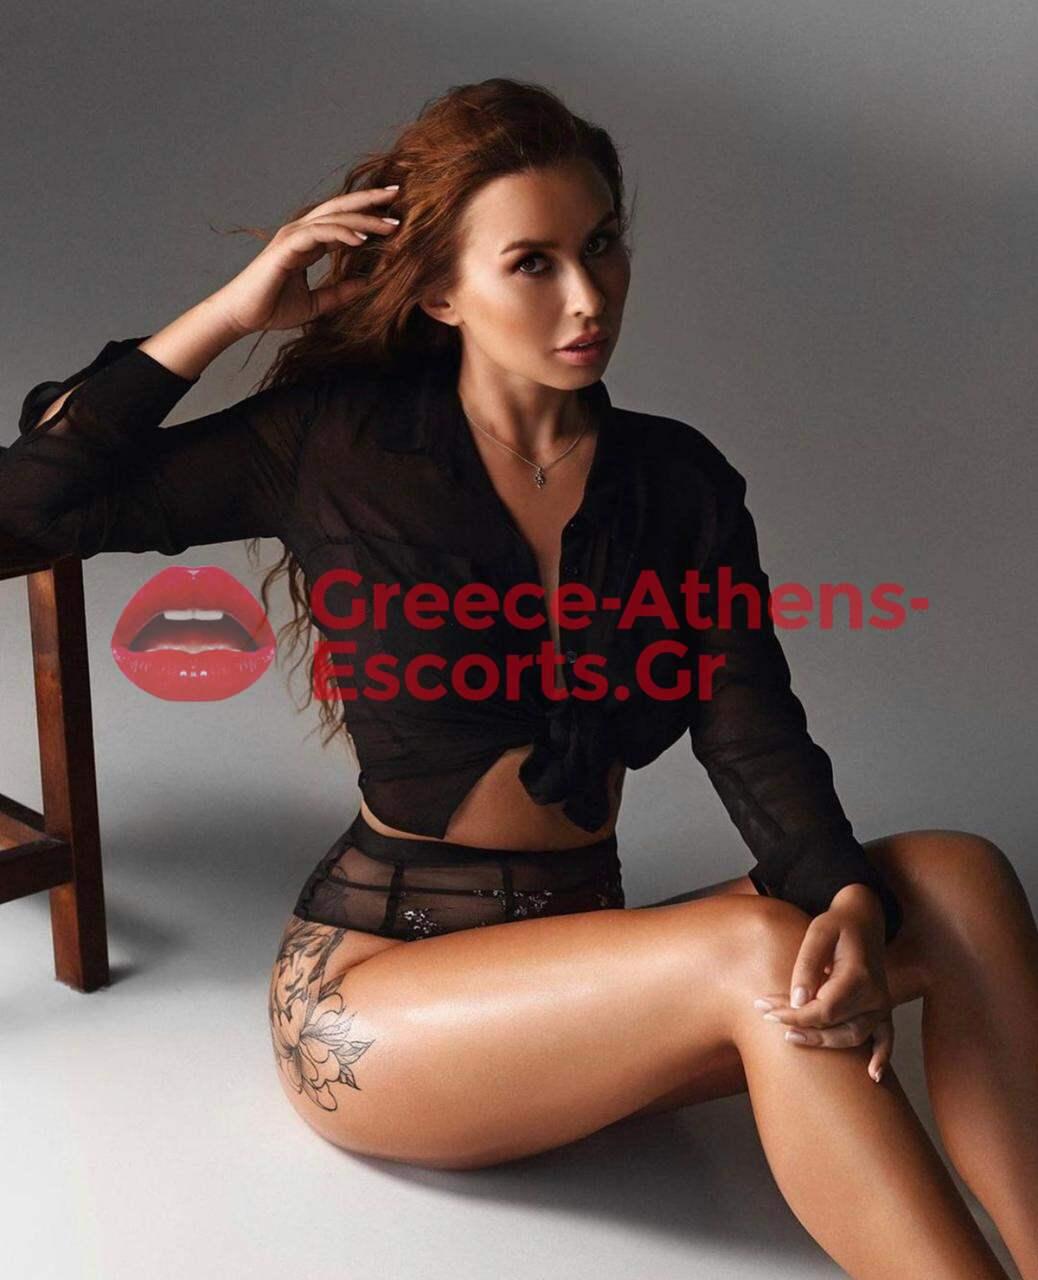 ADRIANNA SEXY ATHENS DIVA ESCORT